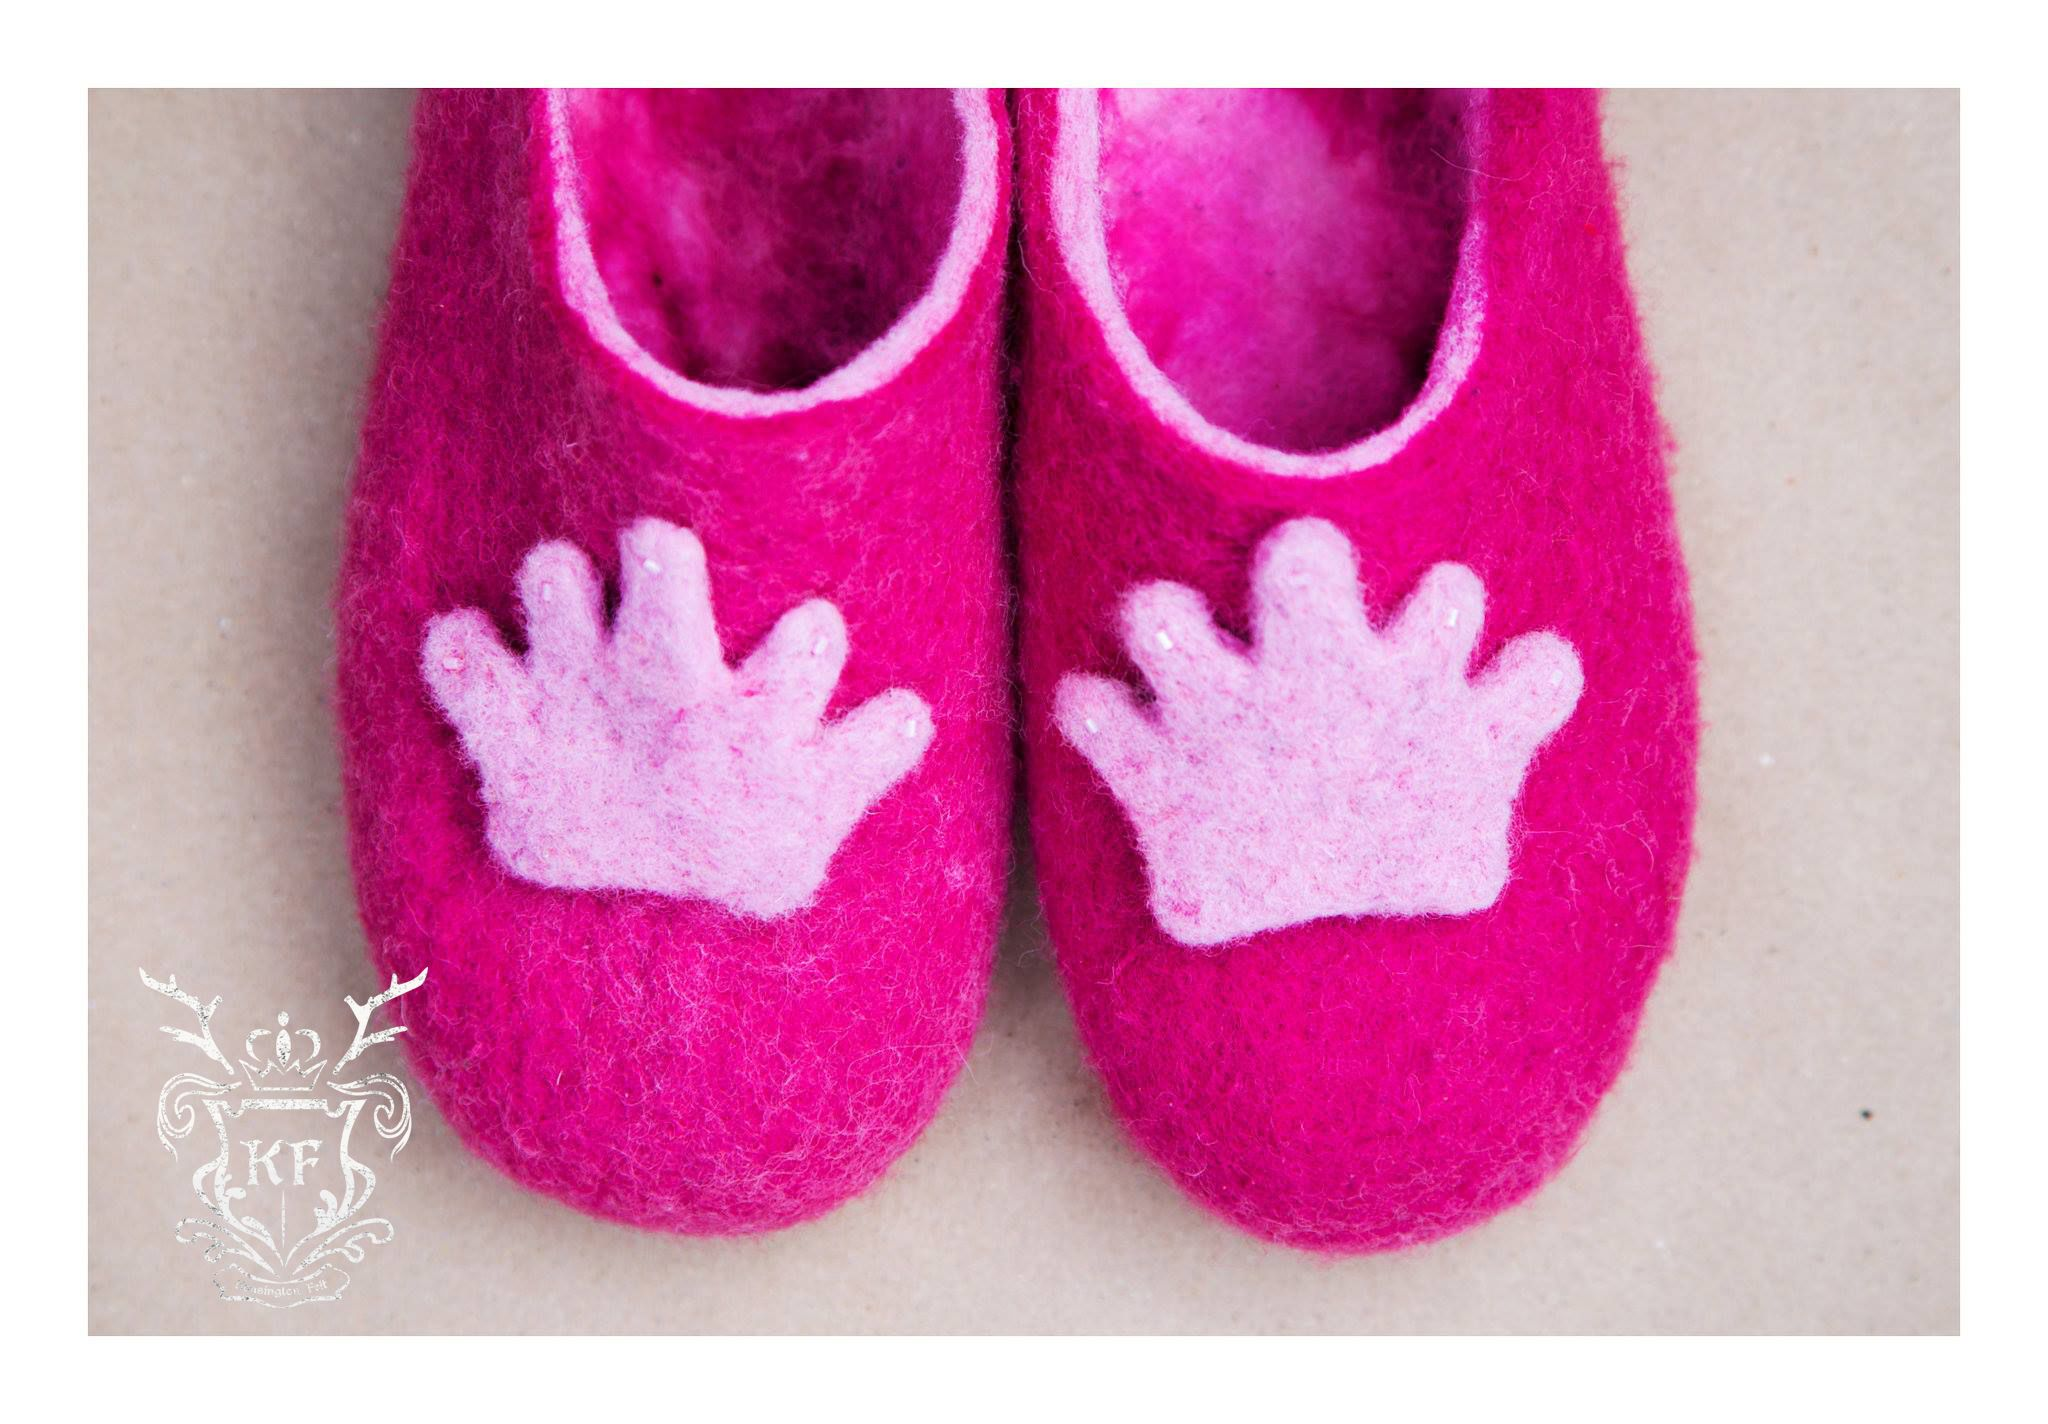 Felted Pink Princess Slippers  Follow us on Facebook! https://www.facebook.com/kensingtonFelt/